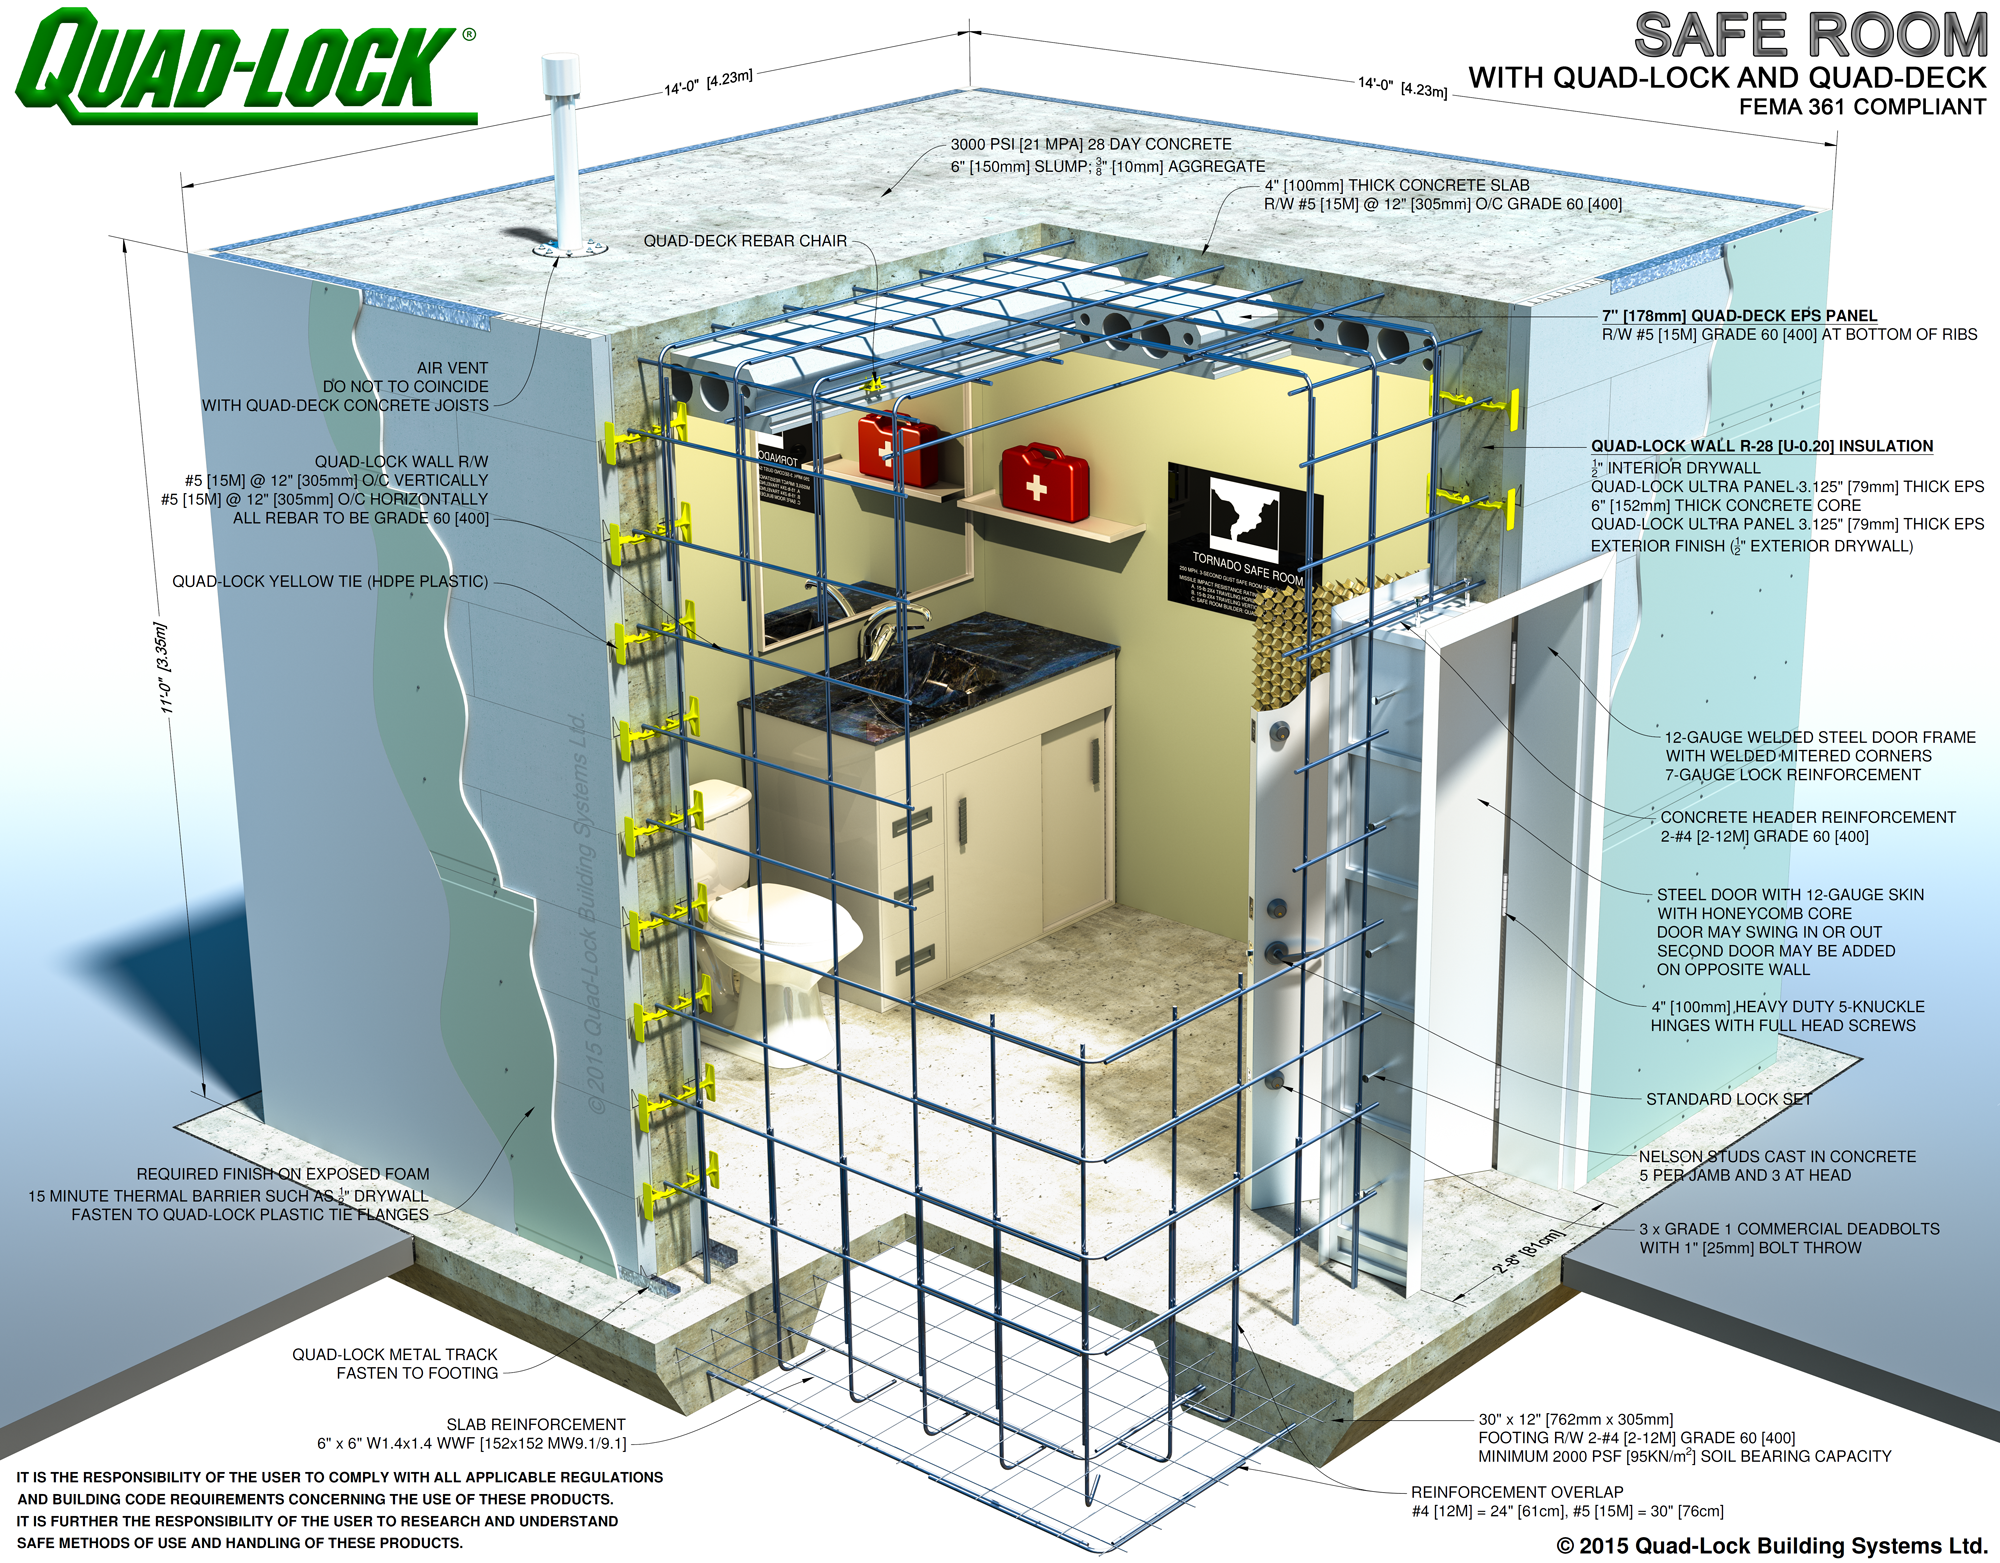 Safe Room Construction Details   House IdeasDIY in 2019